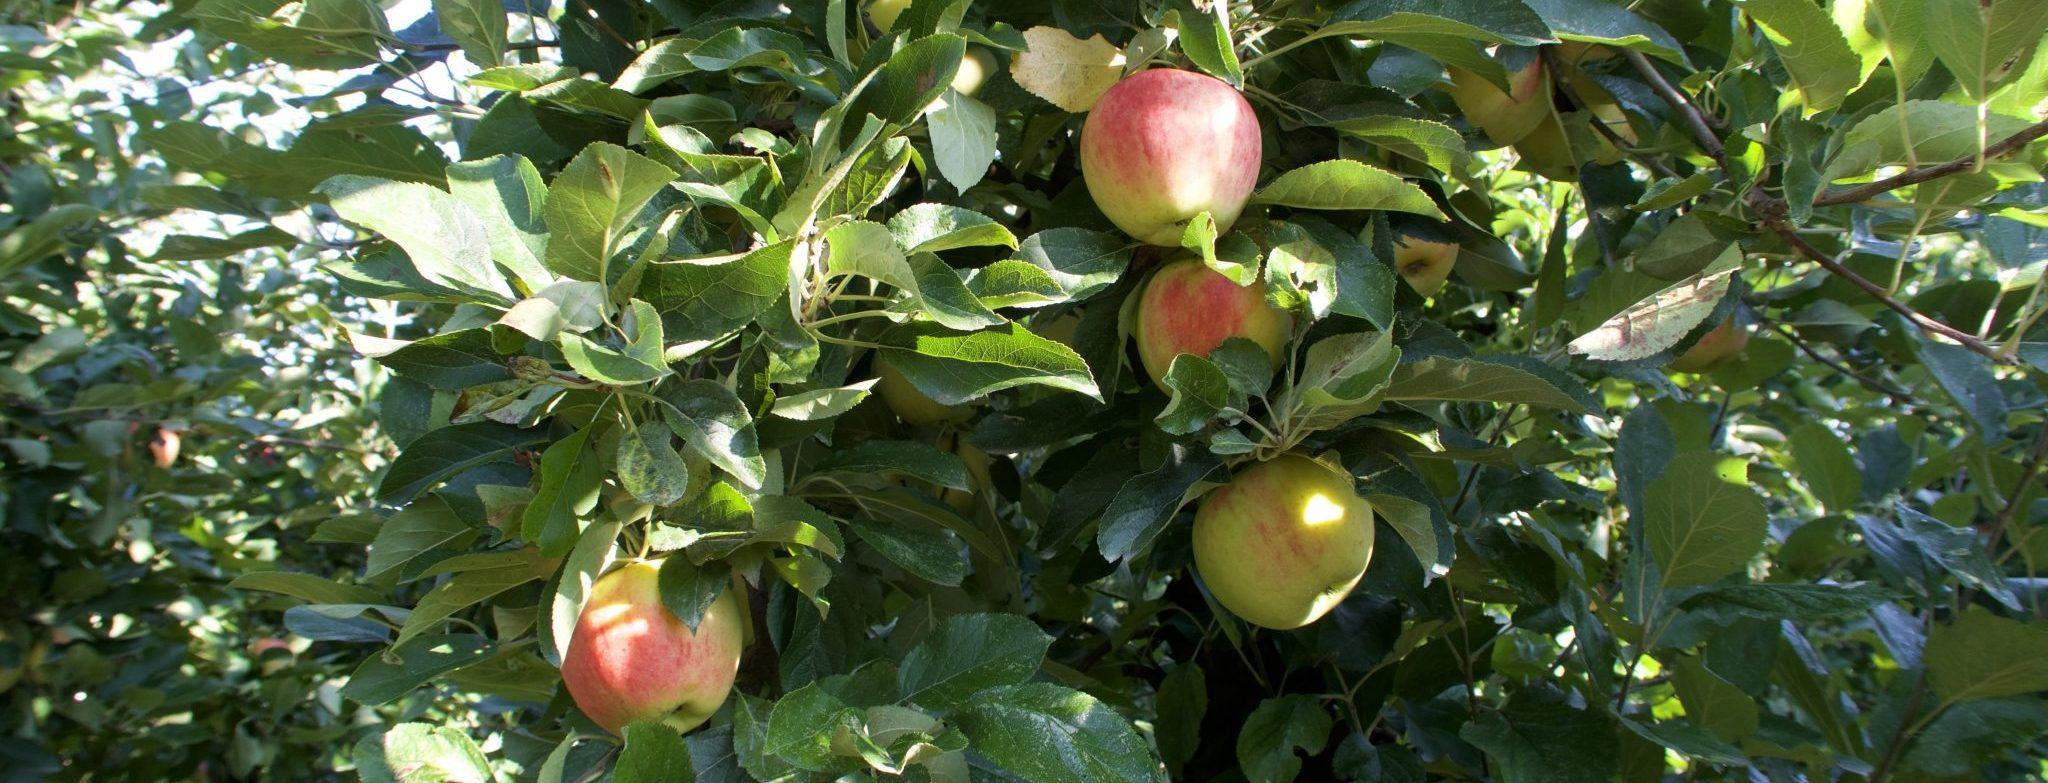 appels olmenhorst